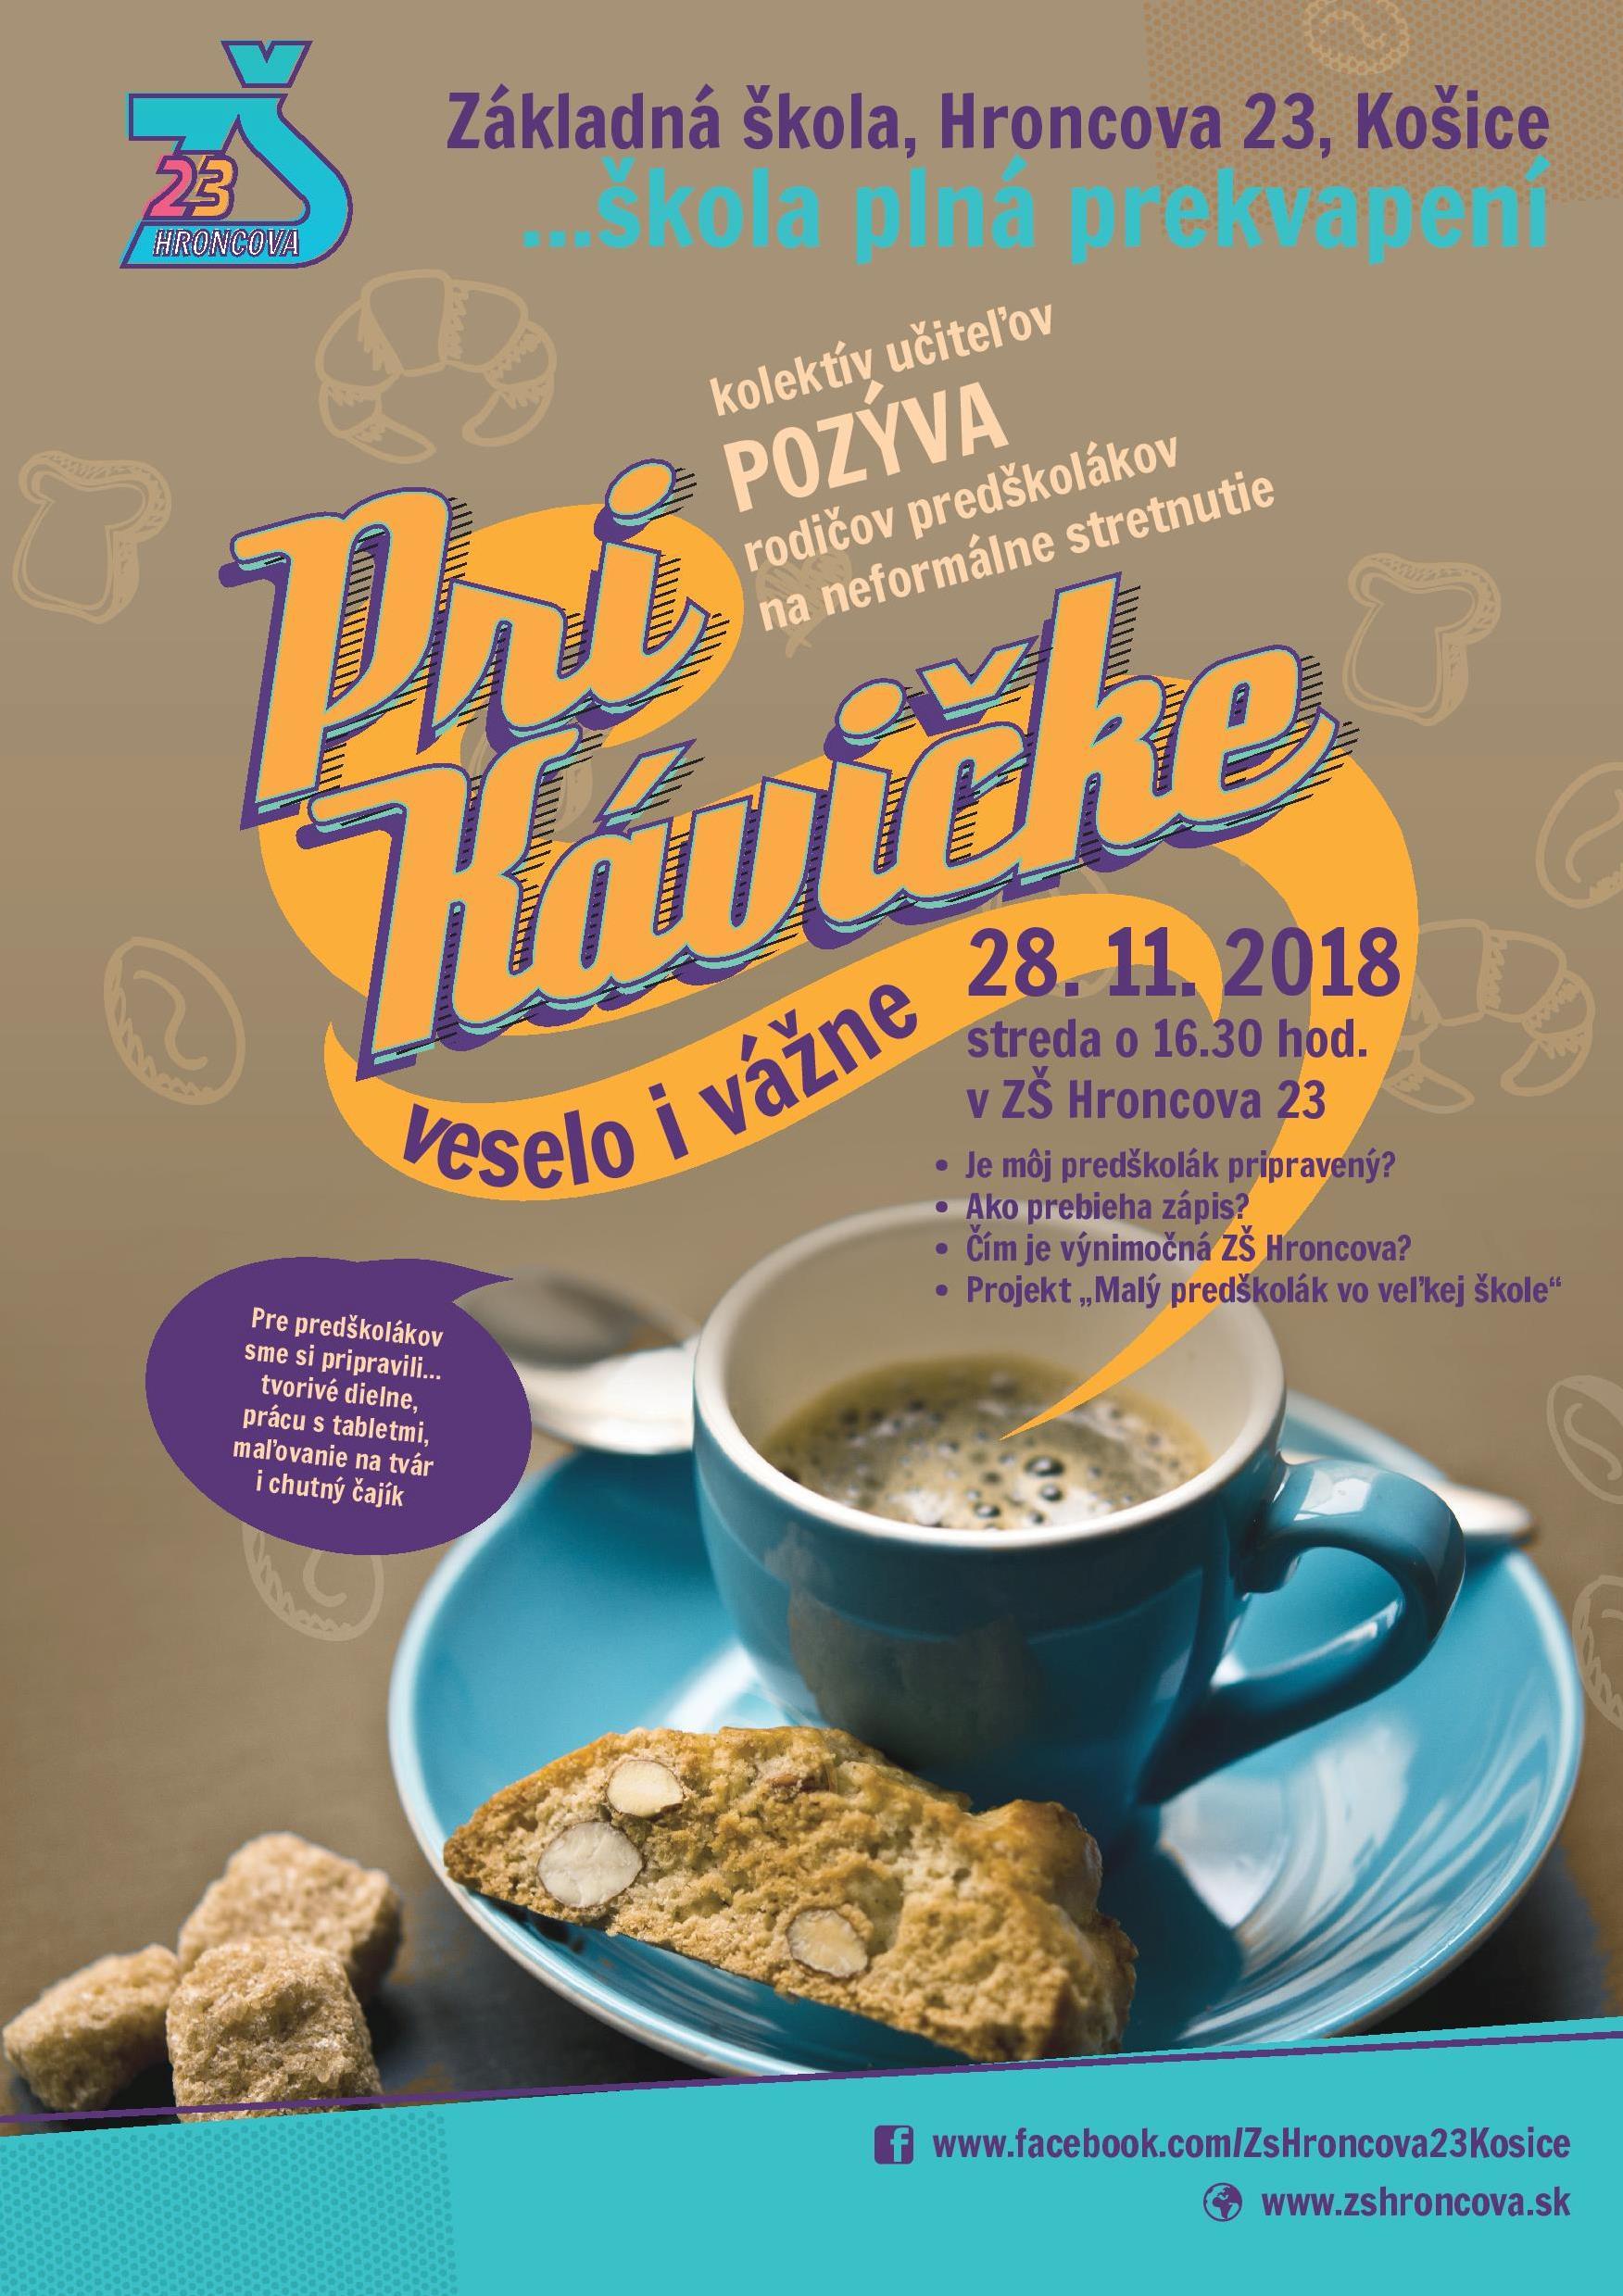 A3-poster-kavicka-181108-page-001